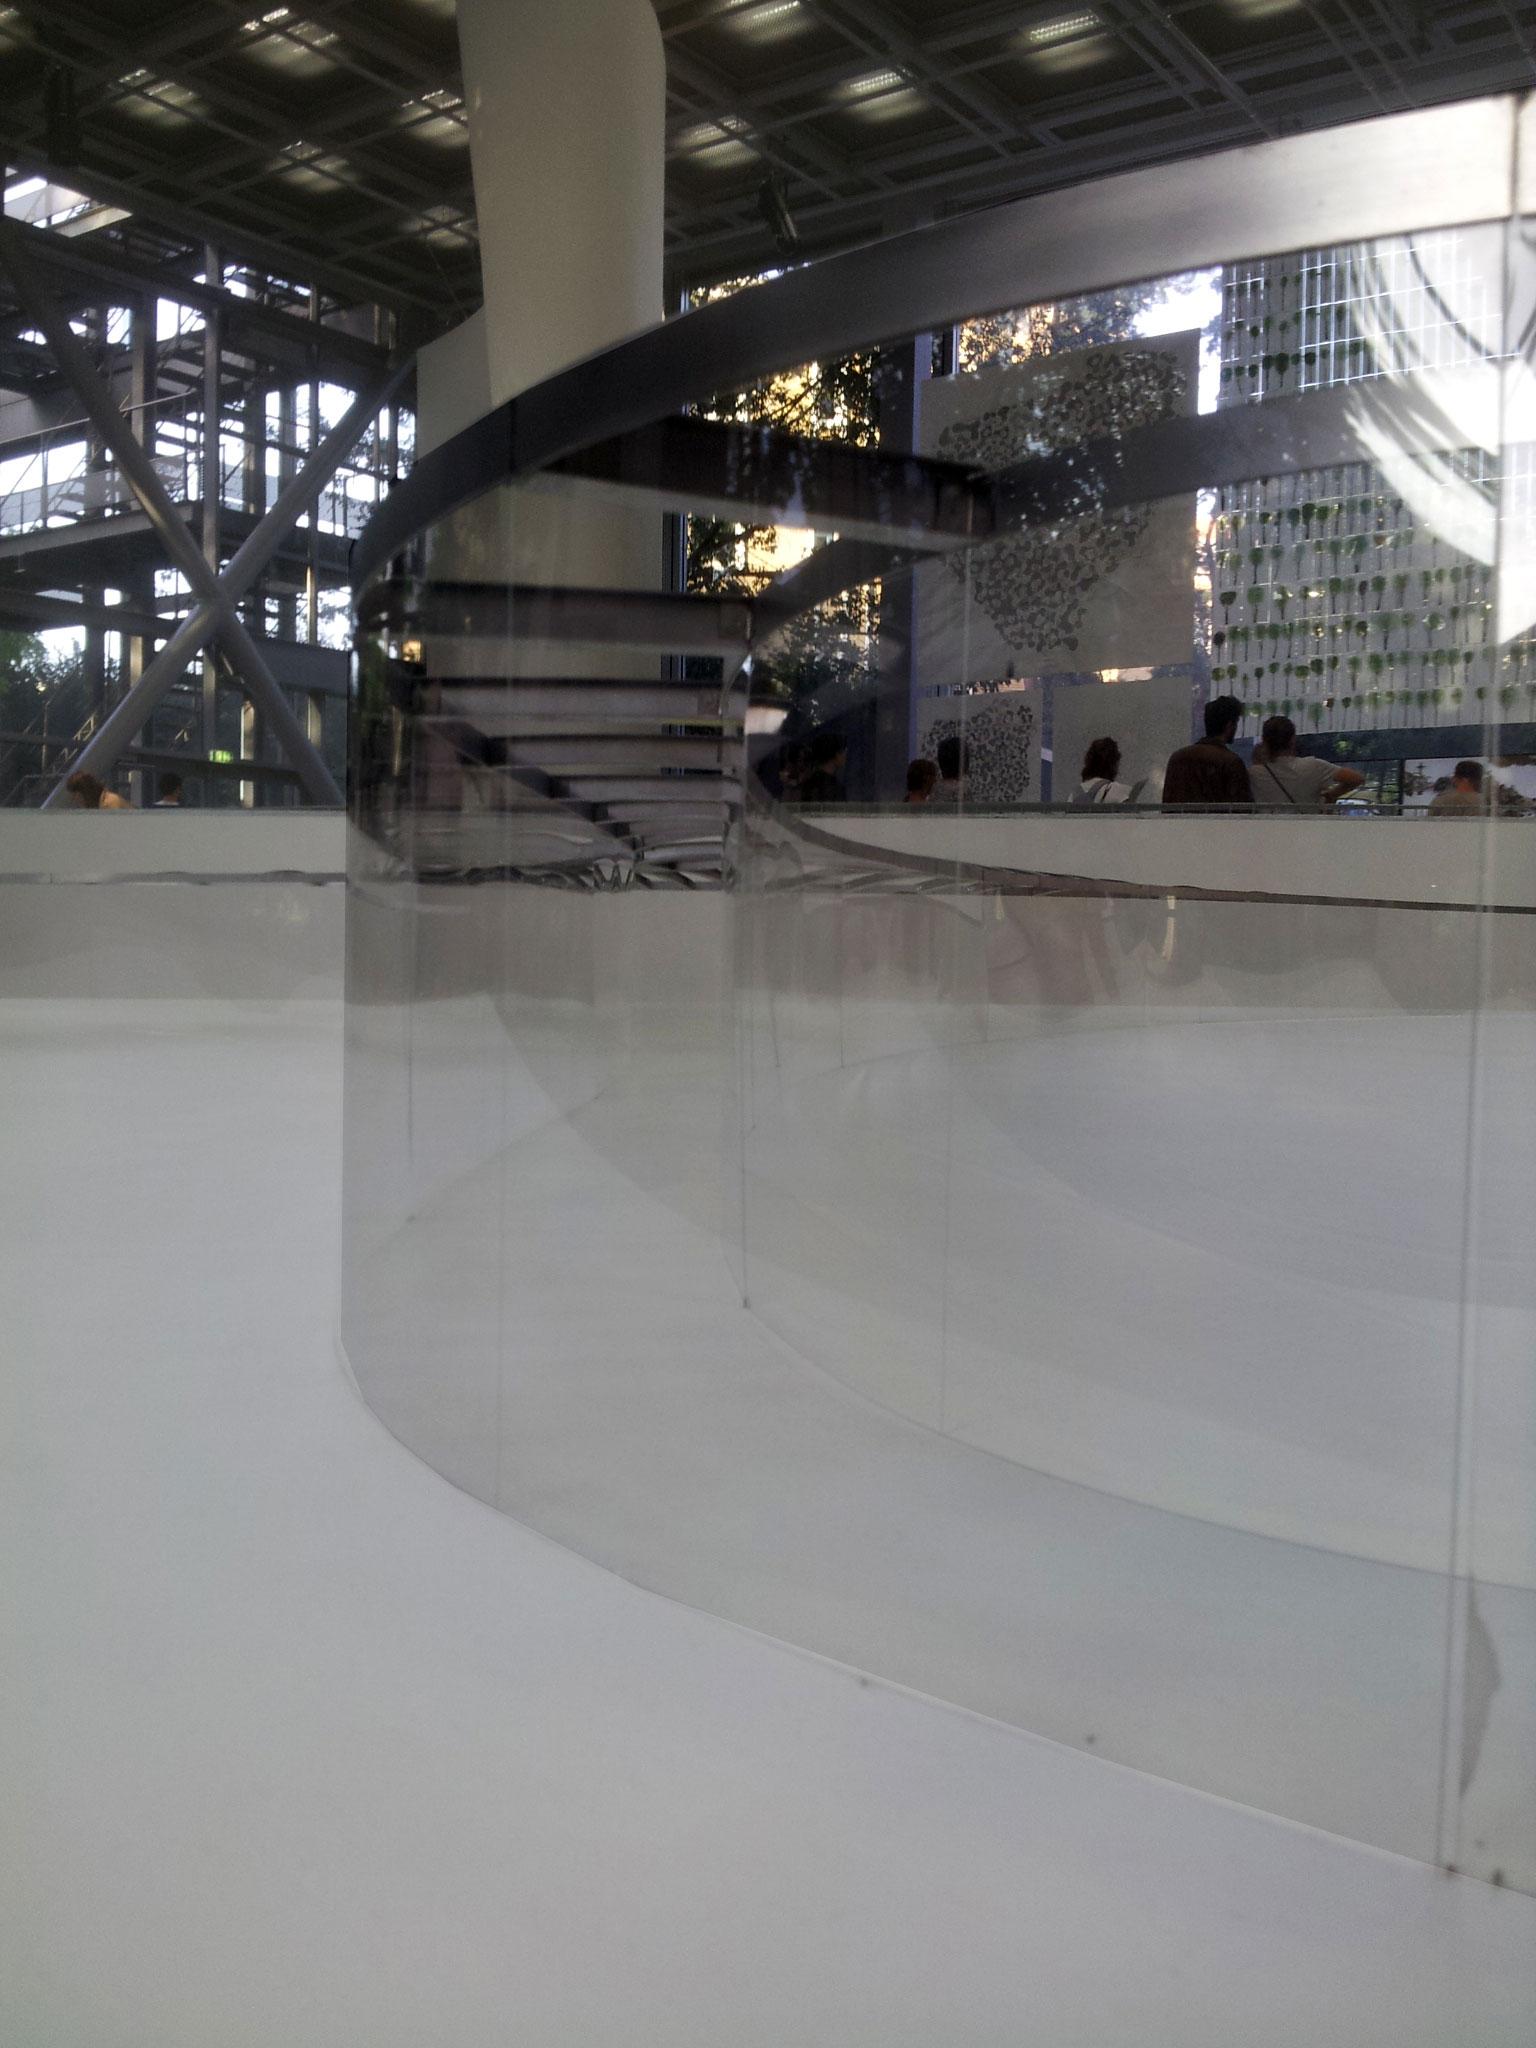 Junya-Ishigami-Freeing-Architecture-02-